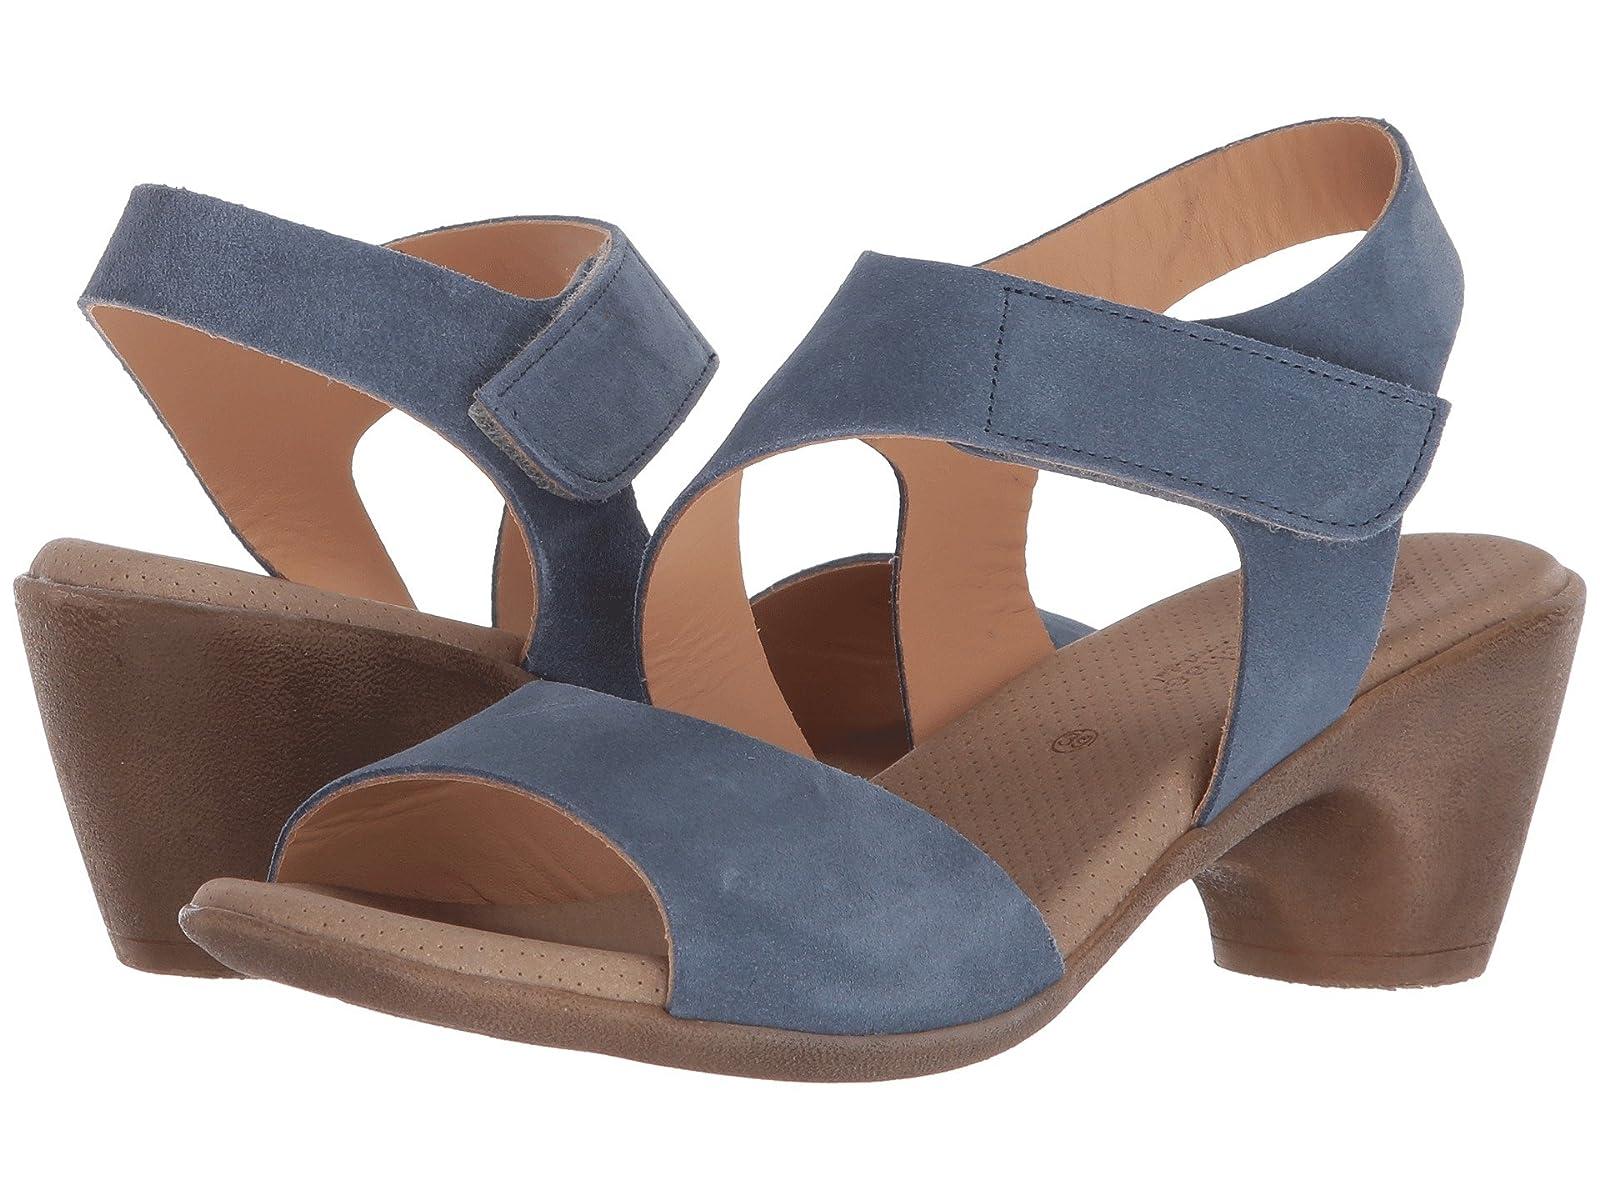 Eric Michael SaritAtmospheric grades have affordable shoes